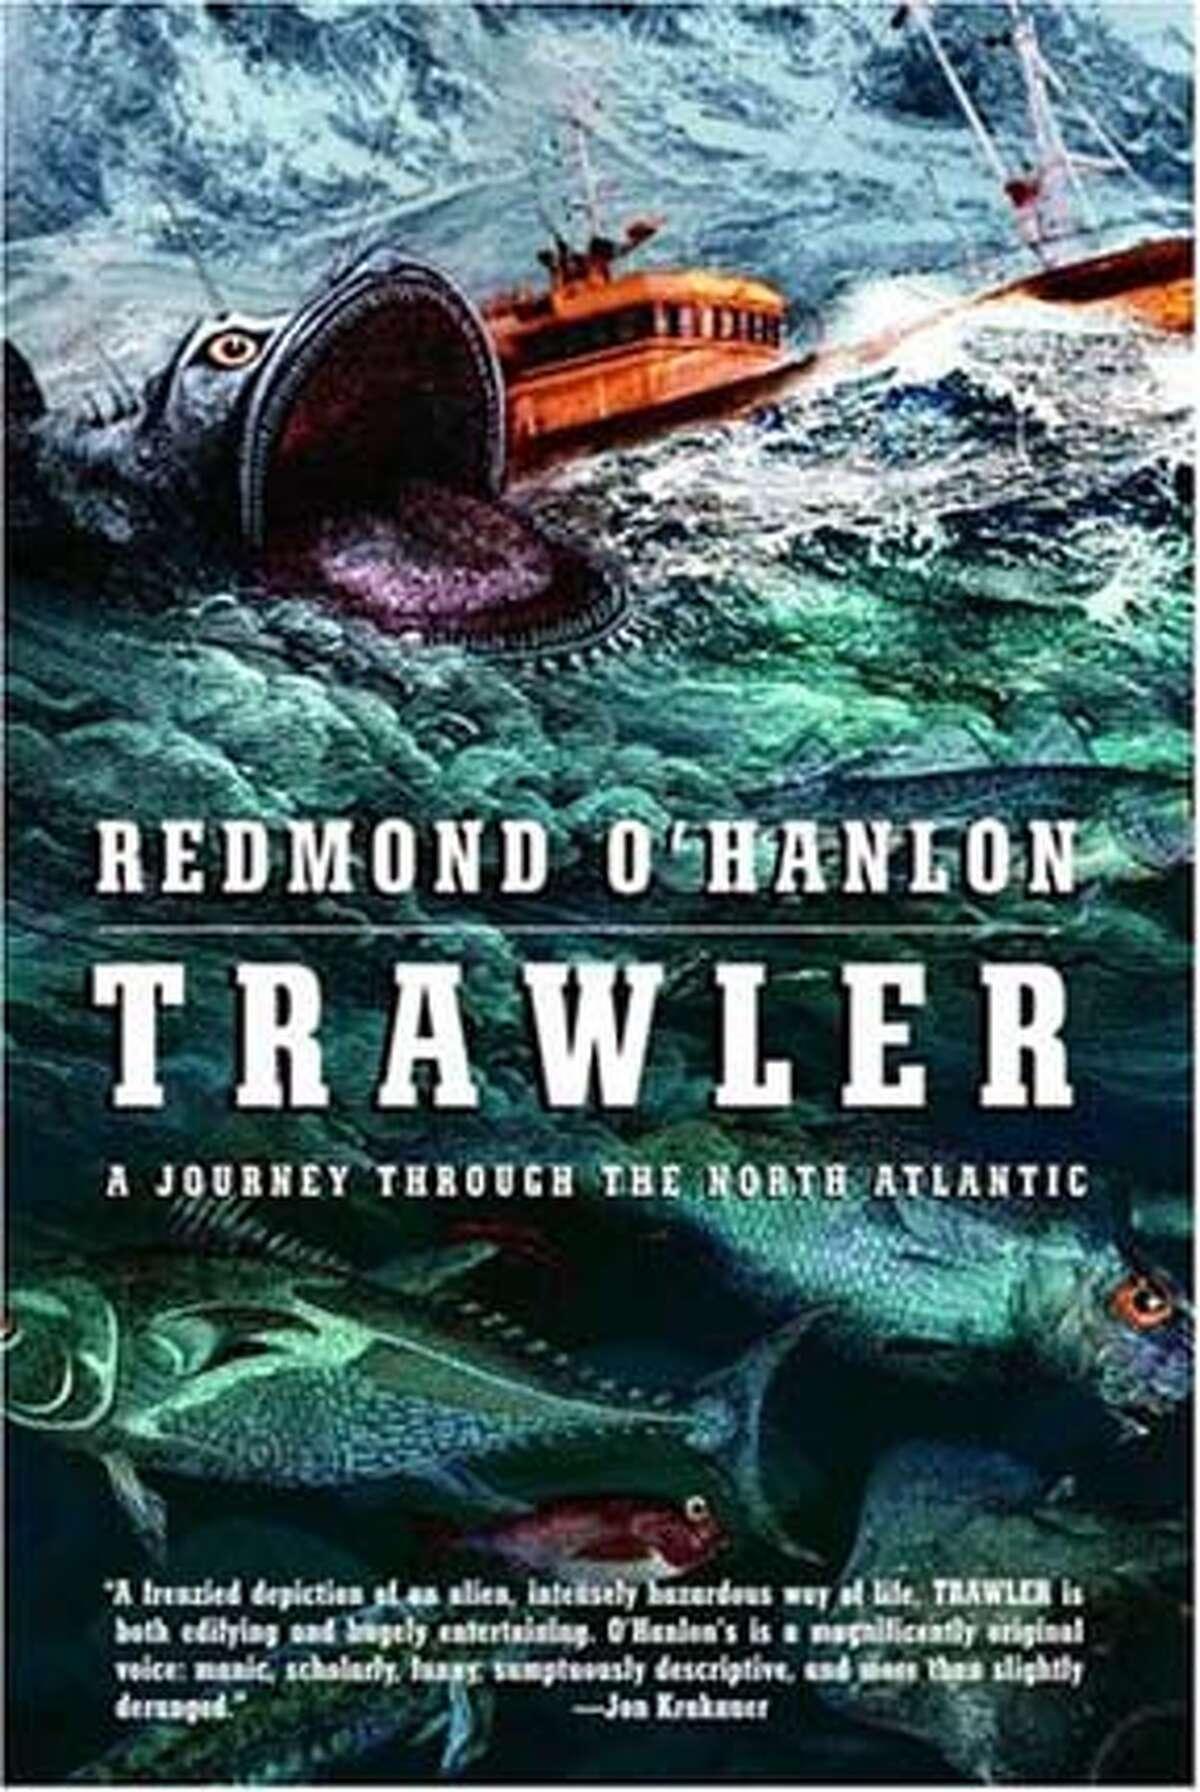 Book cover art for, Trawler.